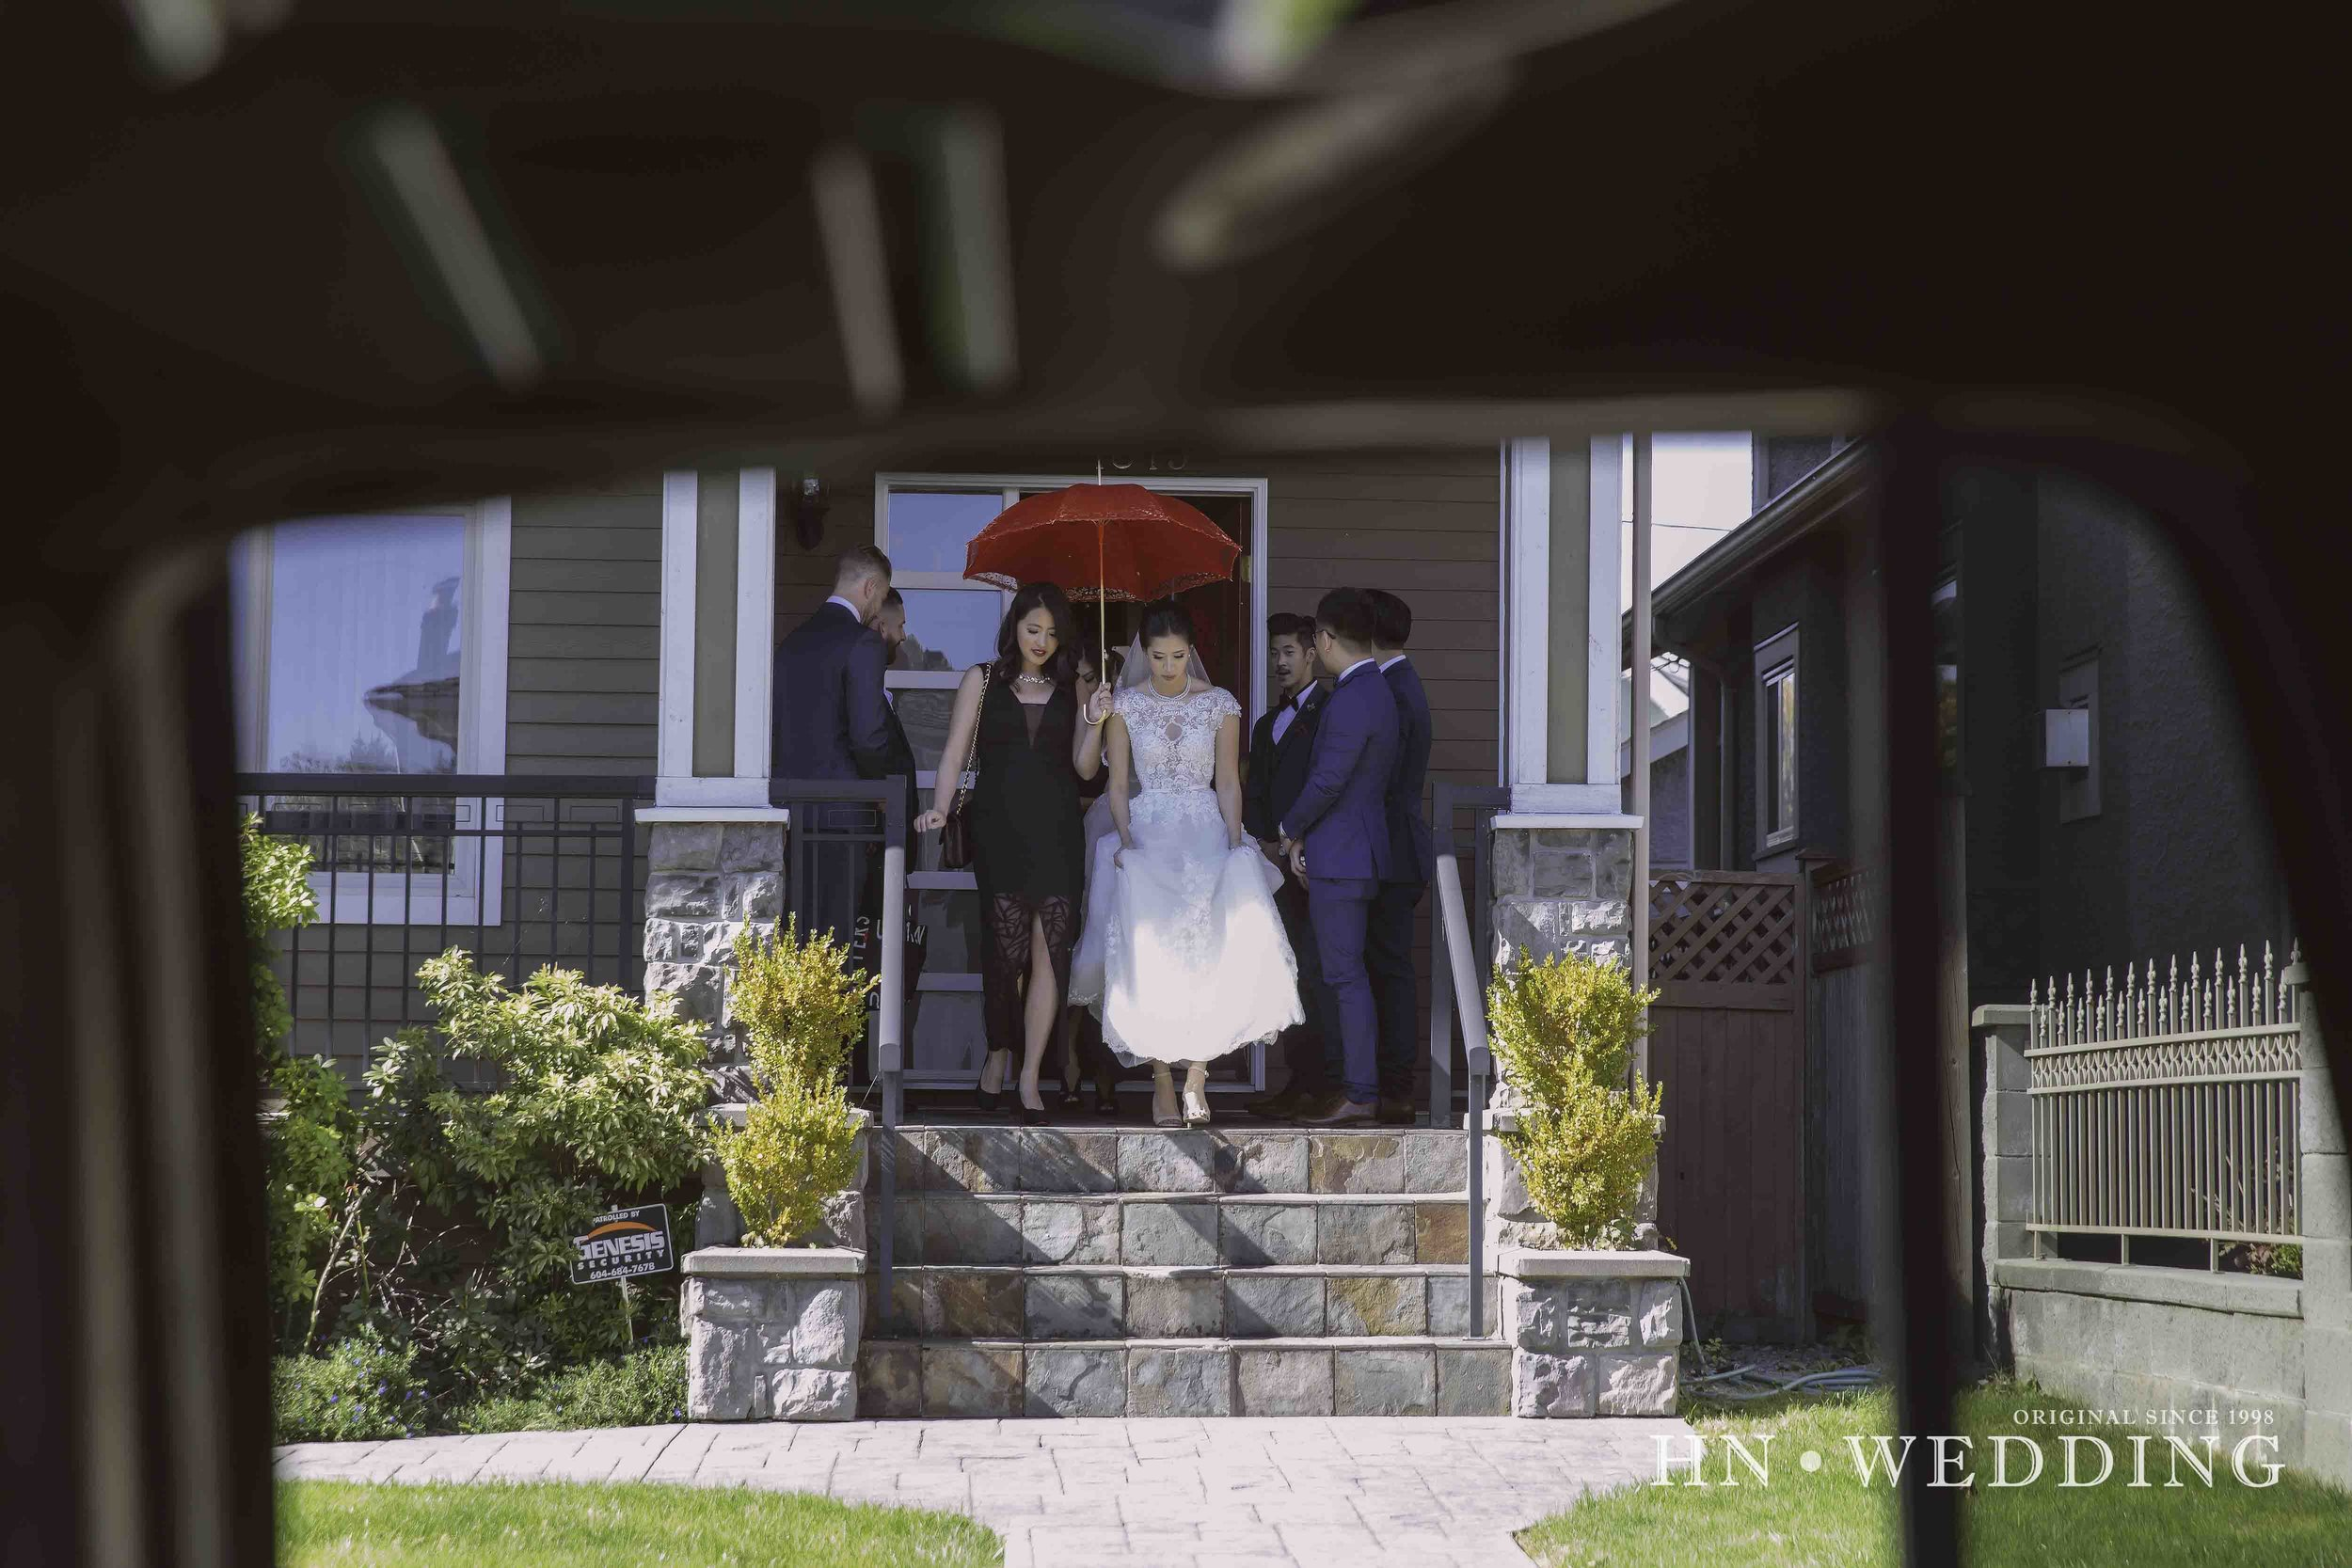 HNwedding-20160815-wedding-012.jpg